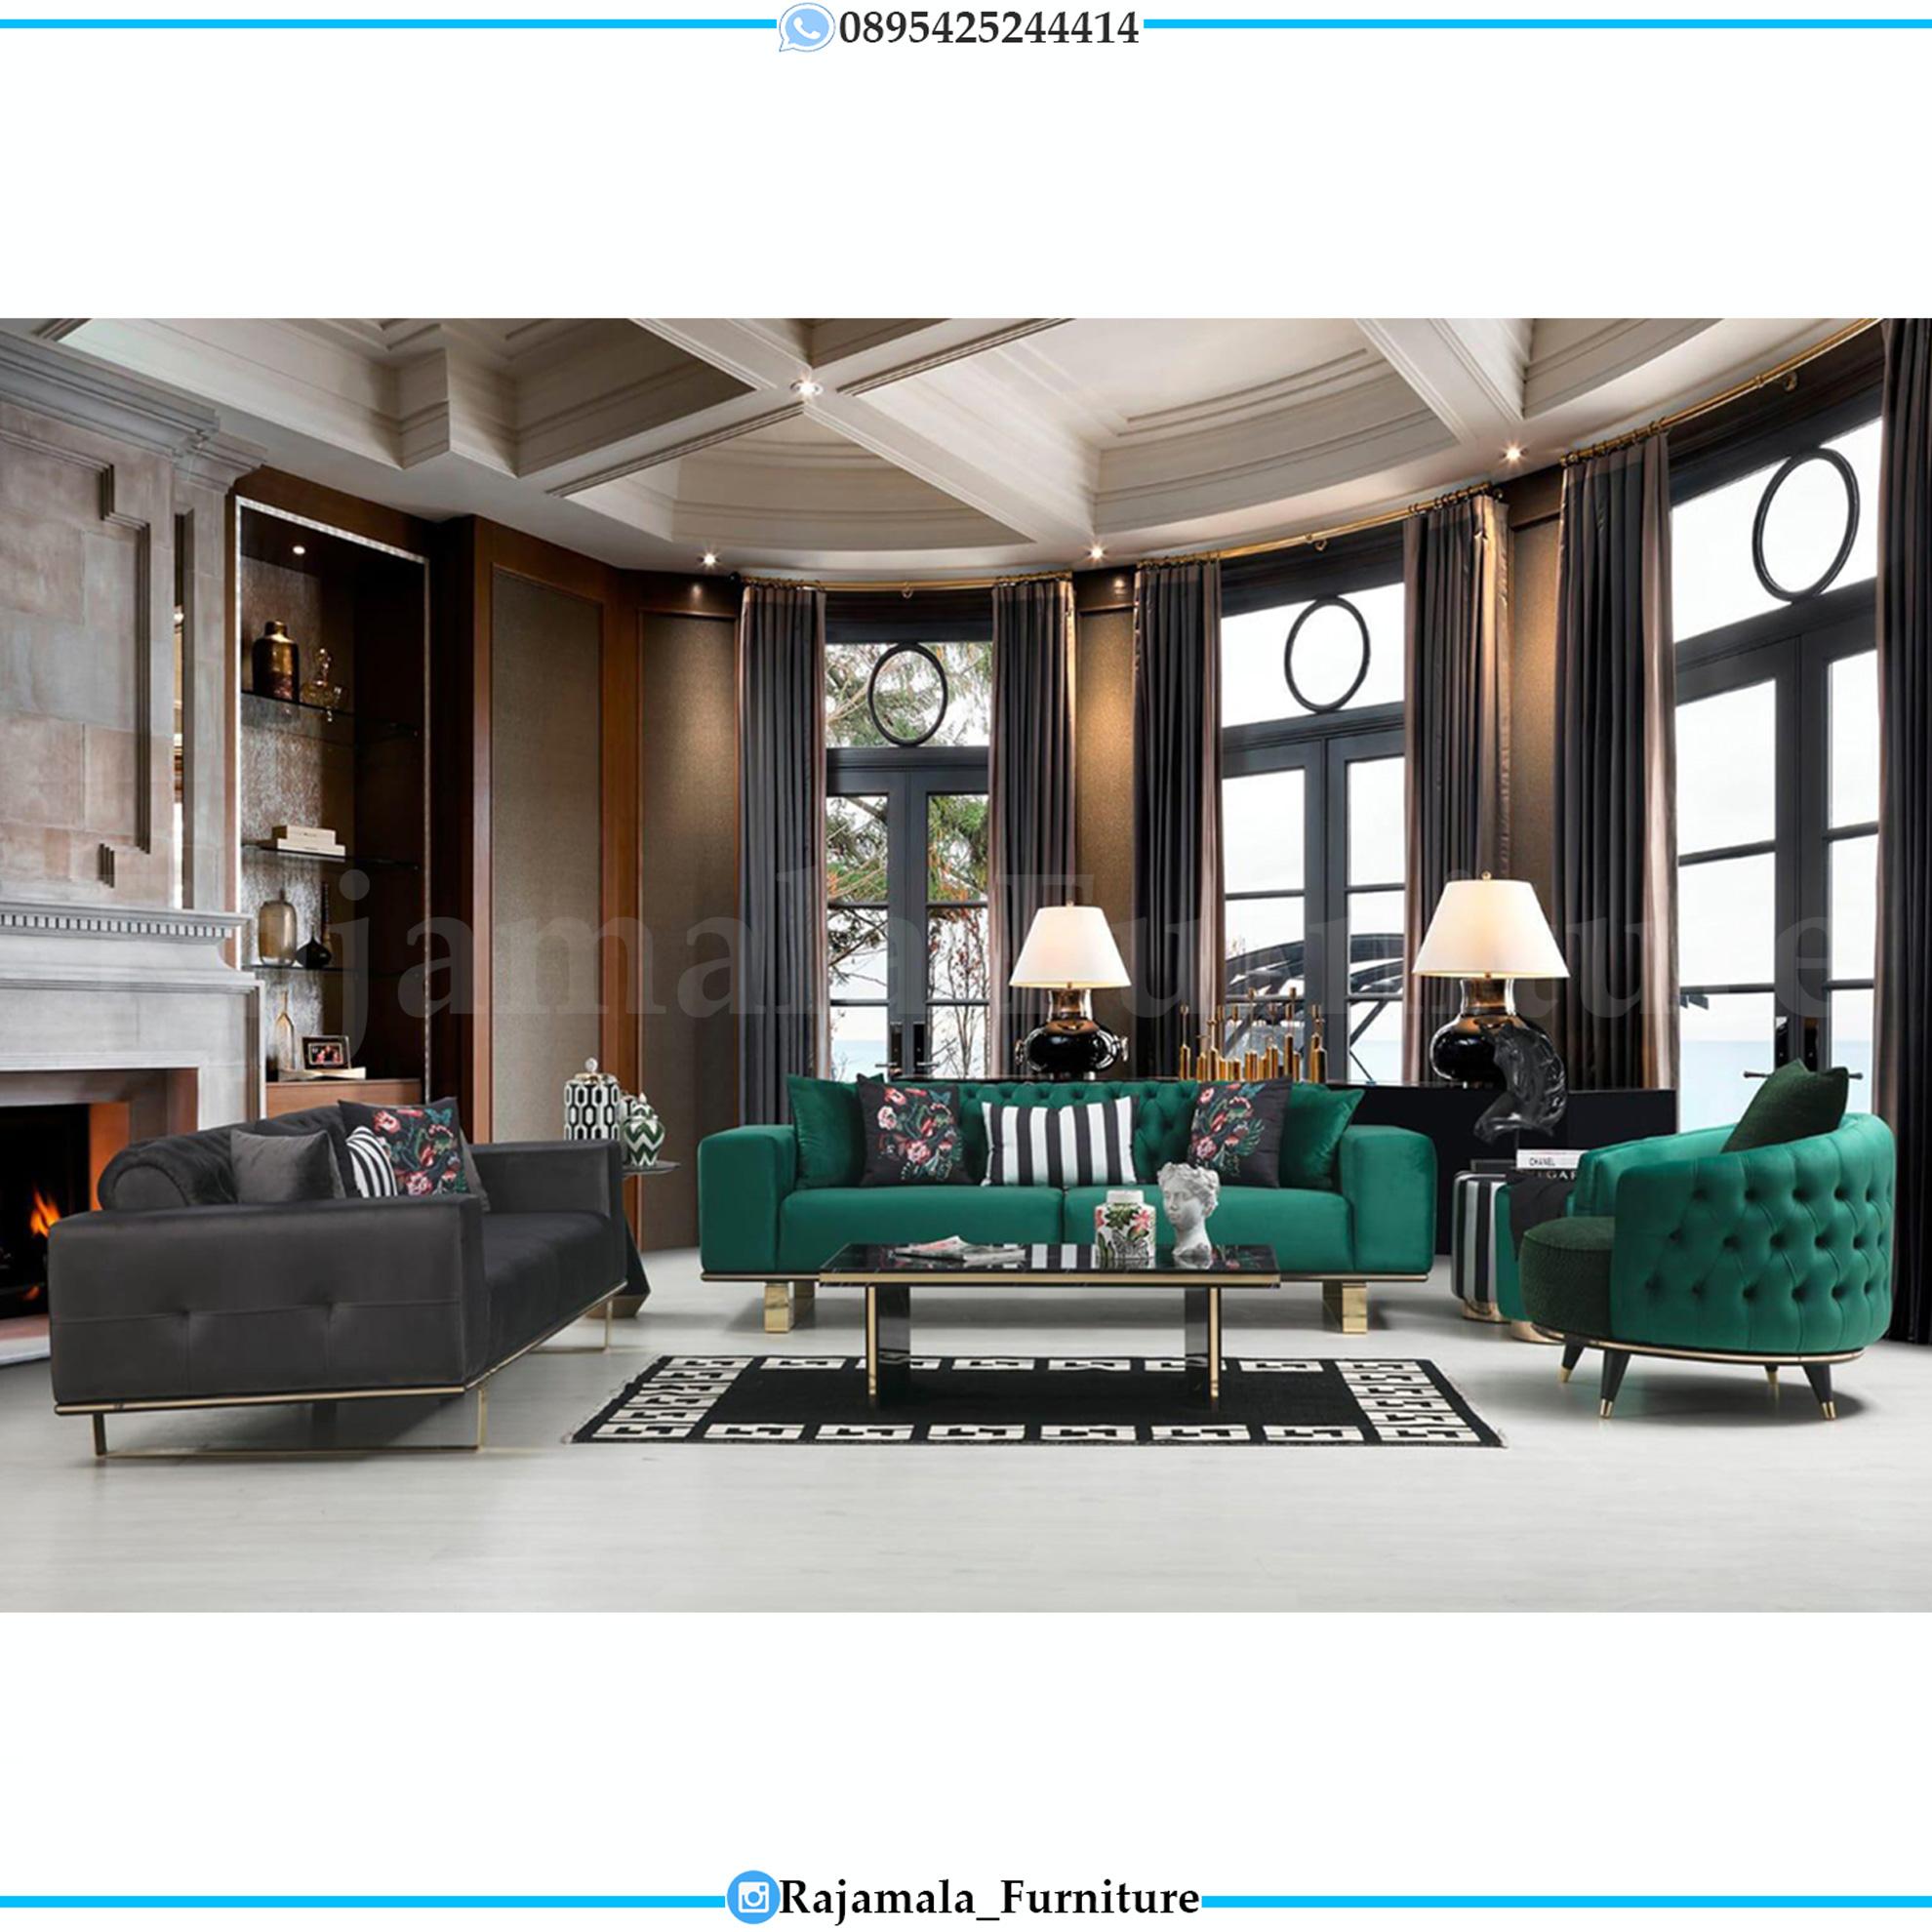 Sofa Tamu Minimalis Modern Stainless Steel Luxury Style RM-0145